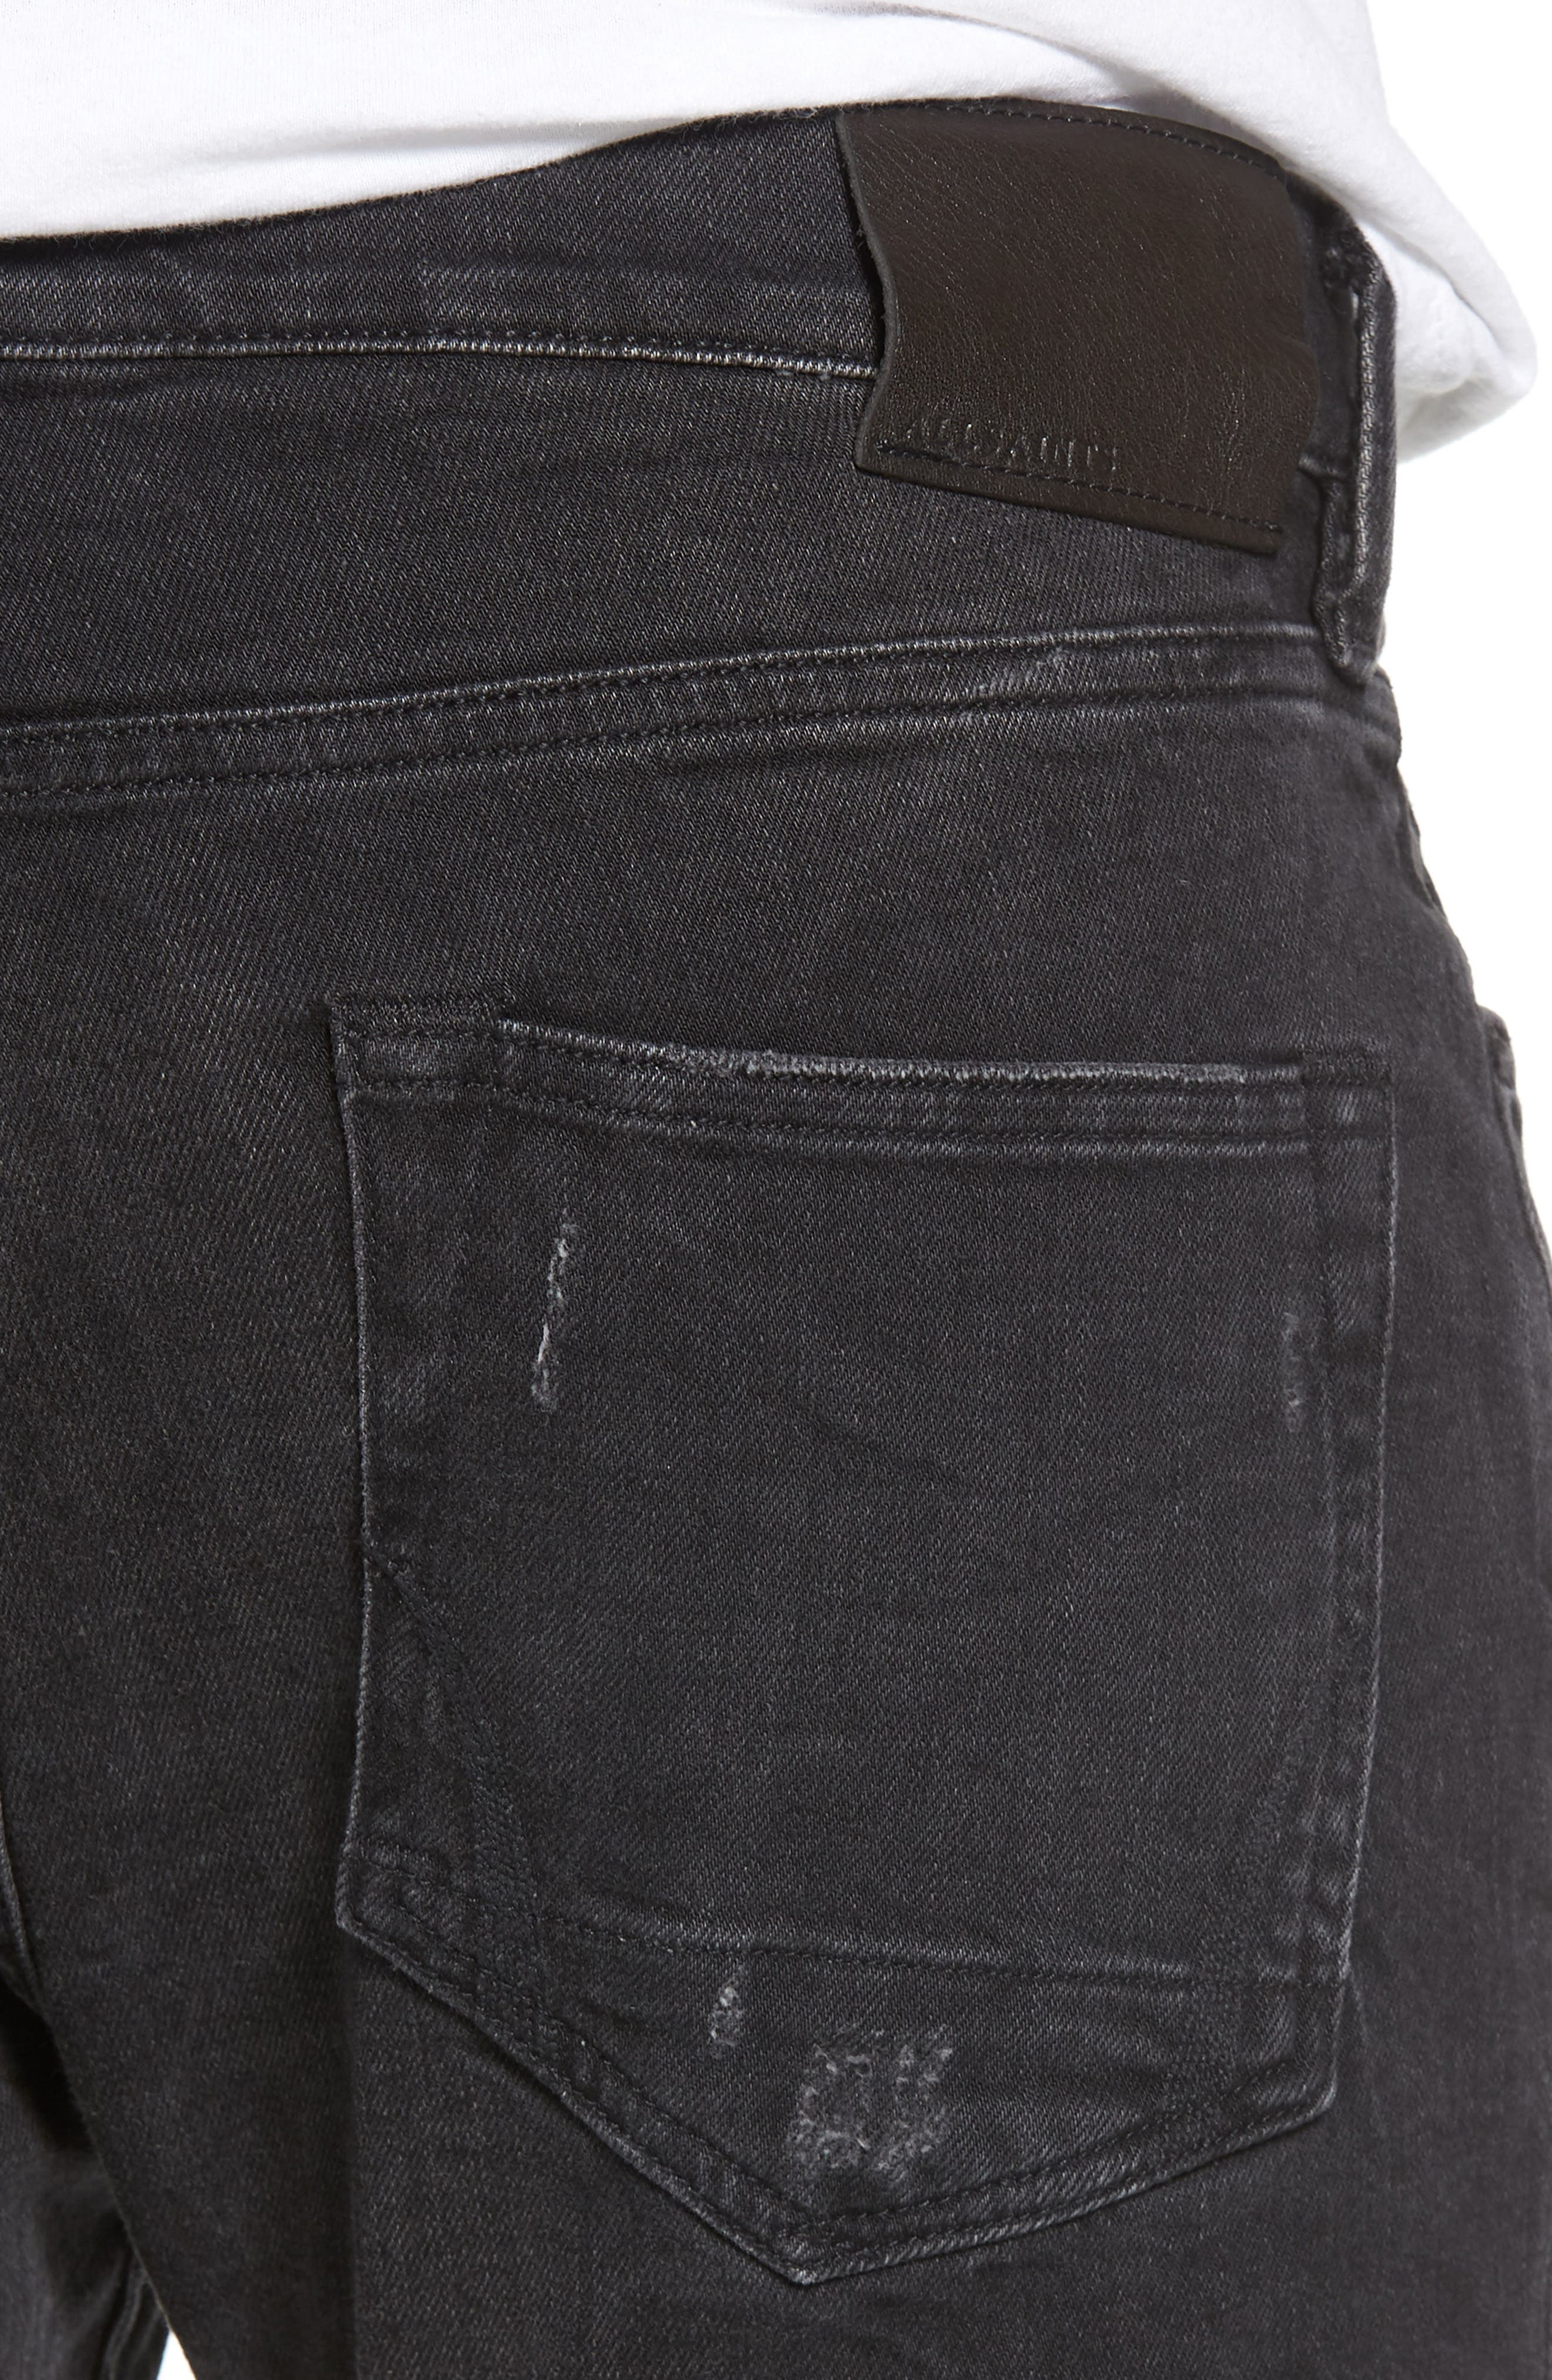 Raveline Skinny Fit Jeans,                             Alternate thumbnail 4, color,                             001